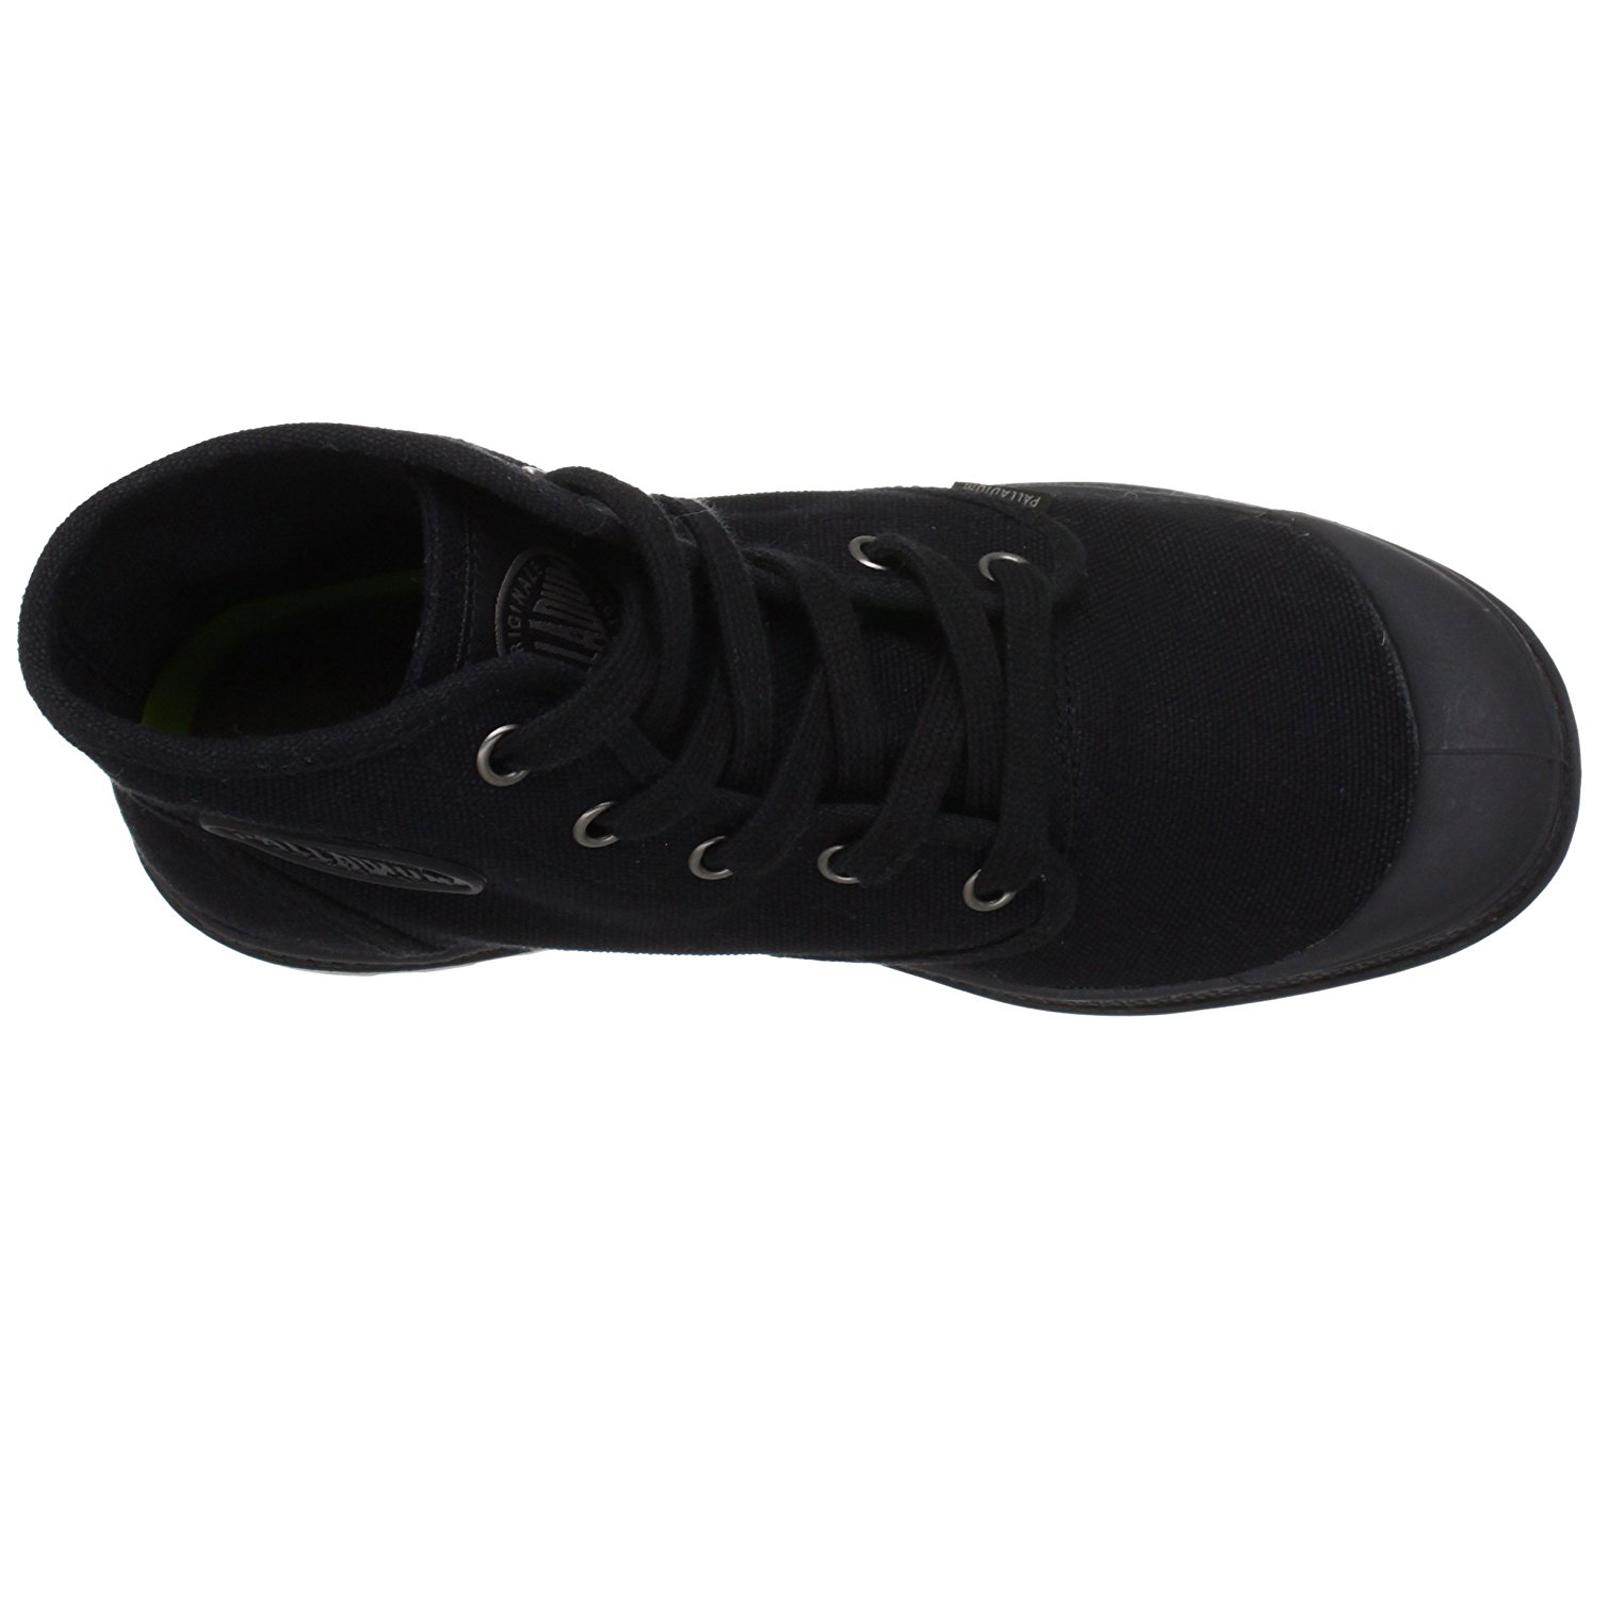 Palladium-Damen-Stiefeletten-Stiefel-Pampa-Hi-Top-Damen-Canvas-Sneaker-Wanderschuhe Indexbild 7